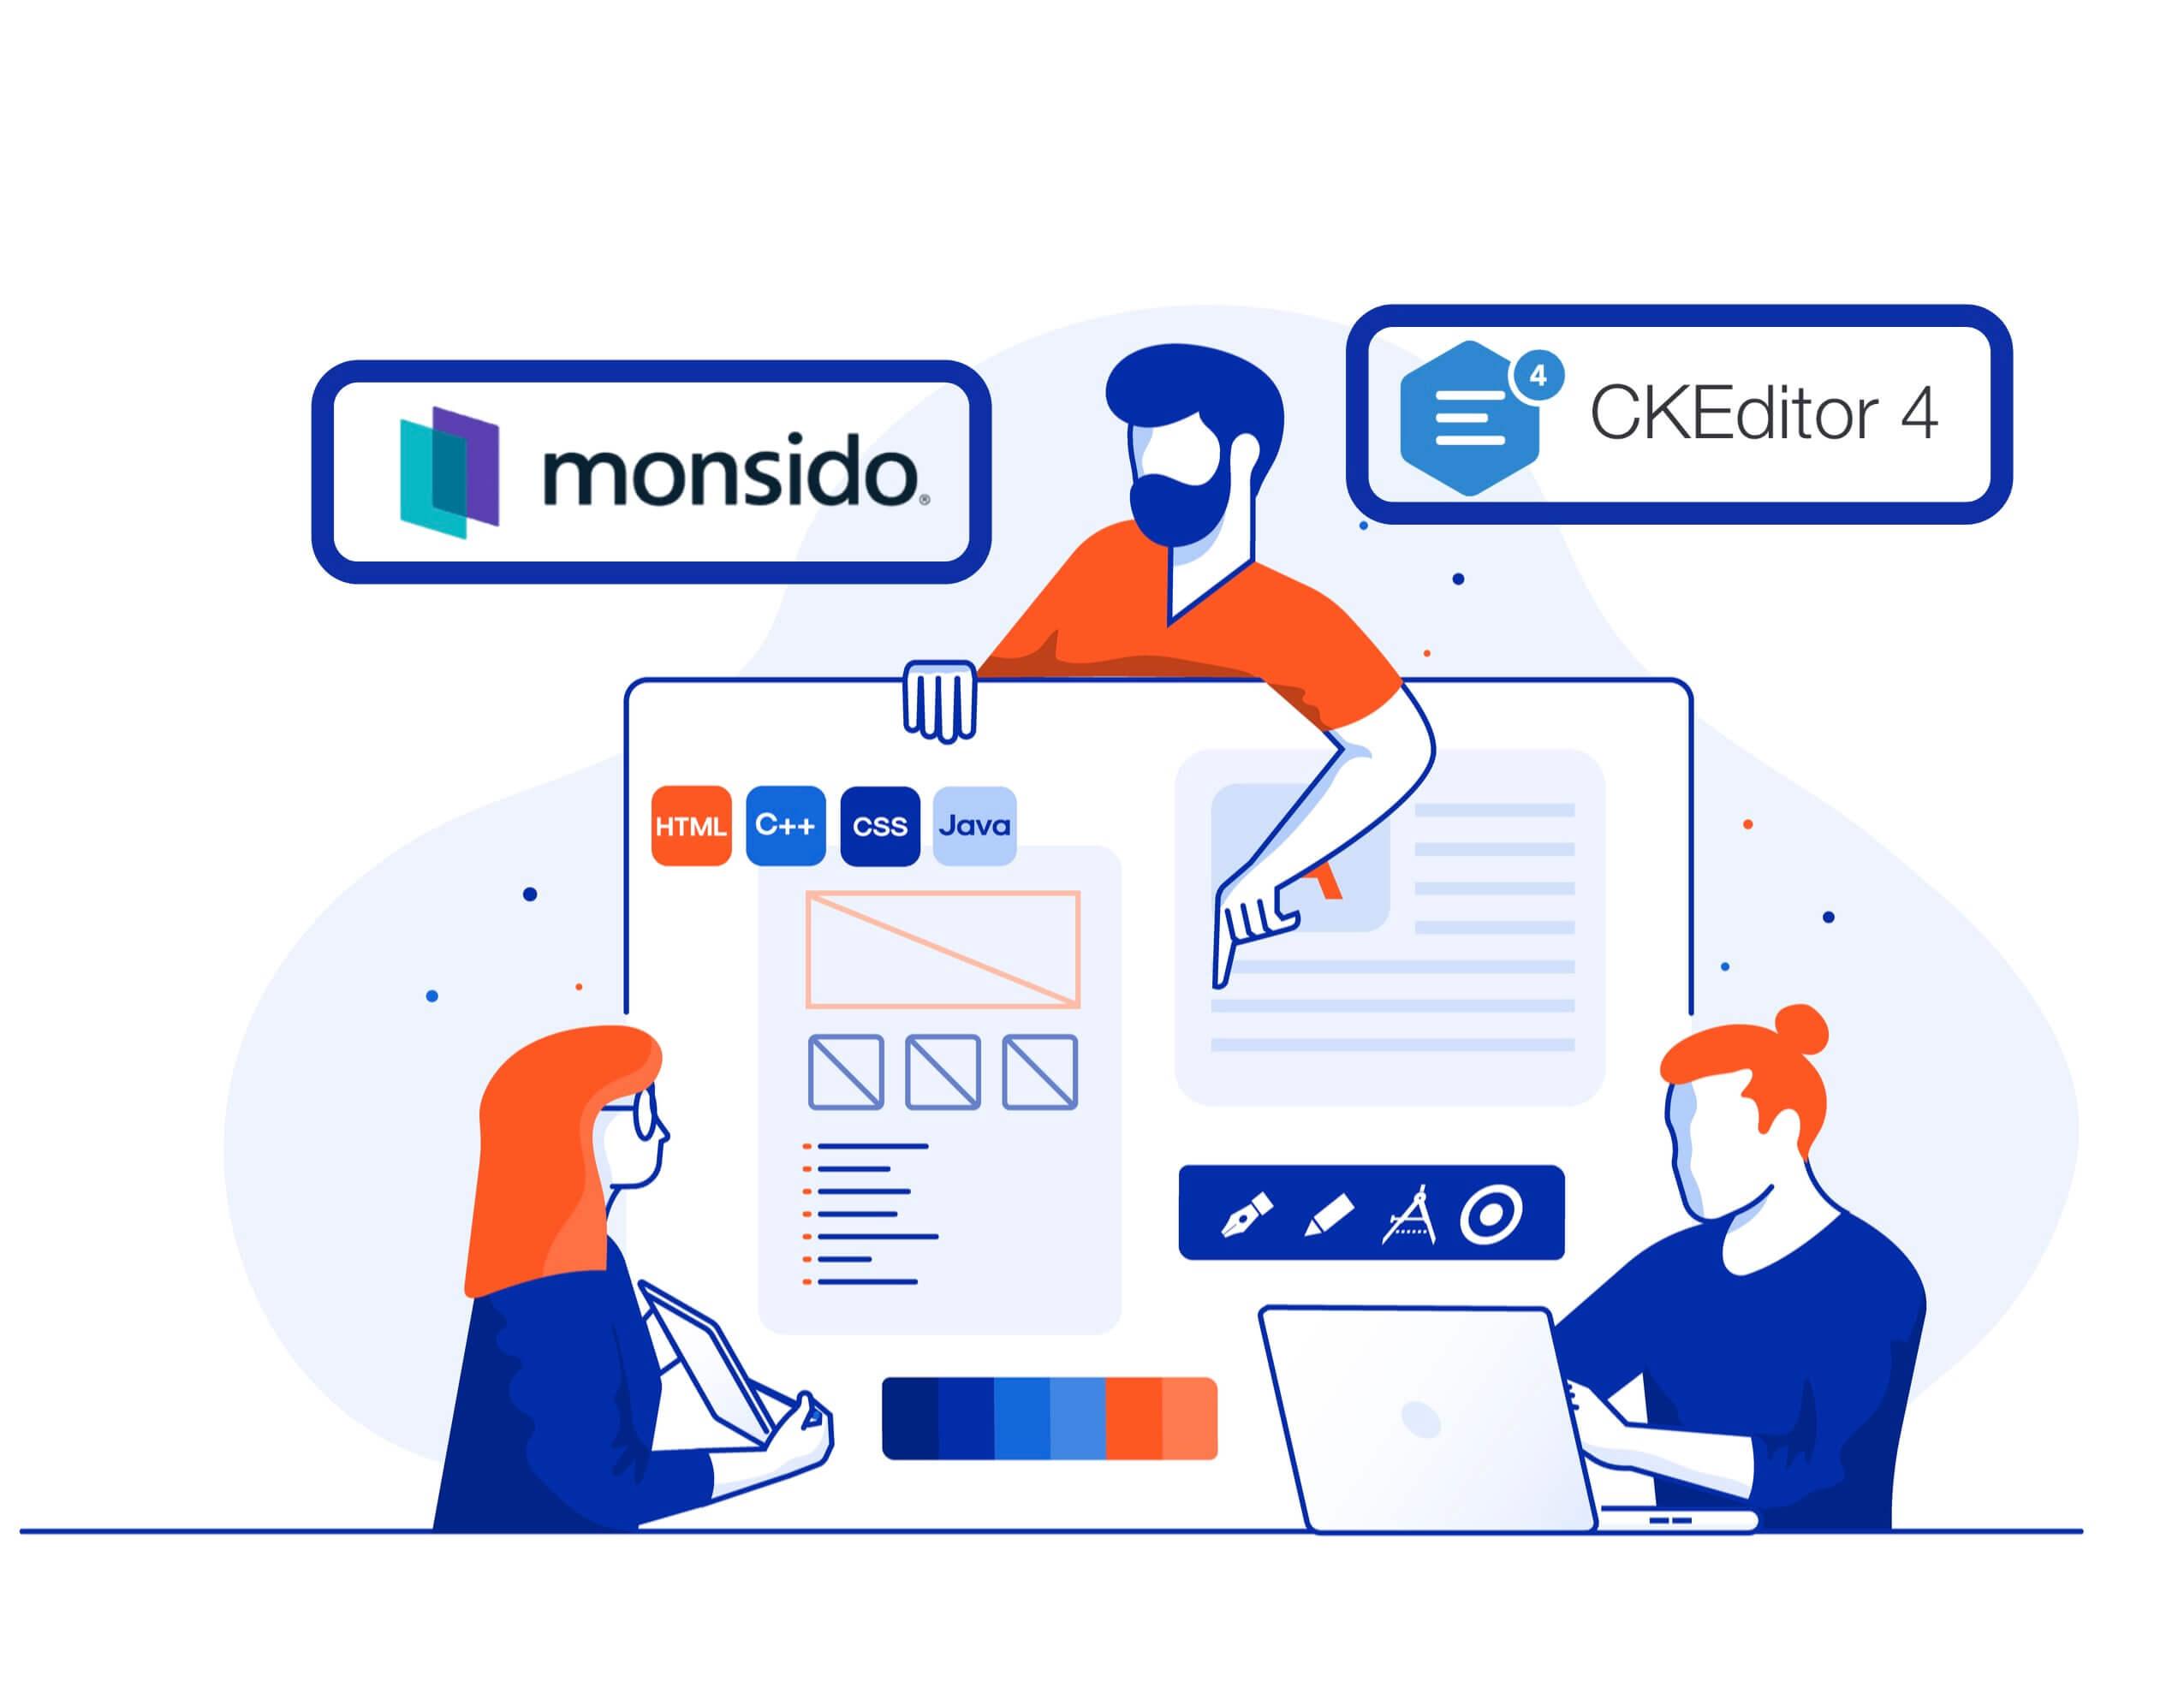 Monsido vs CKEditor